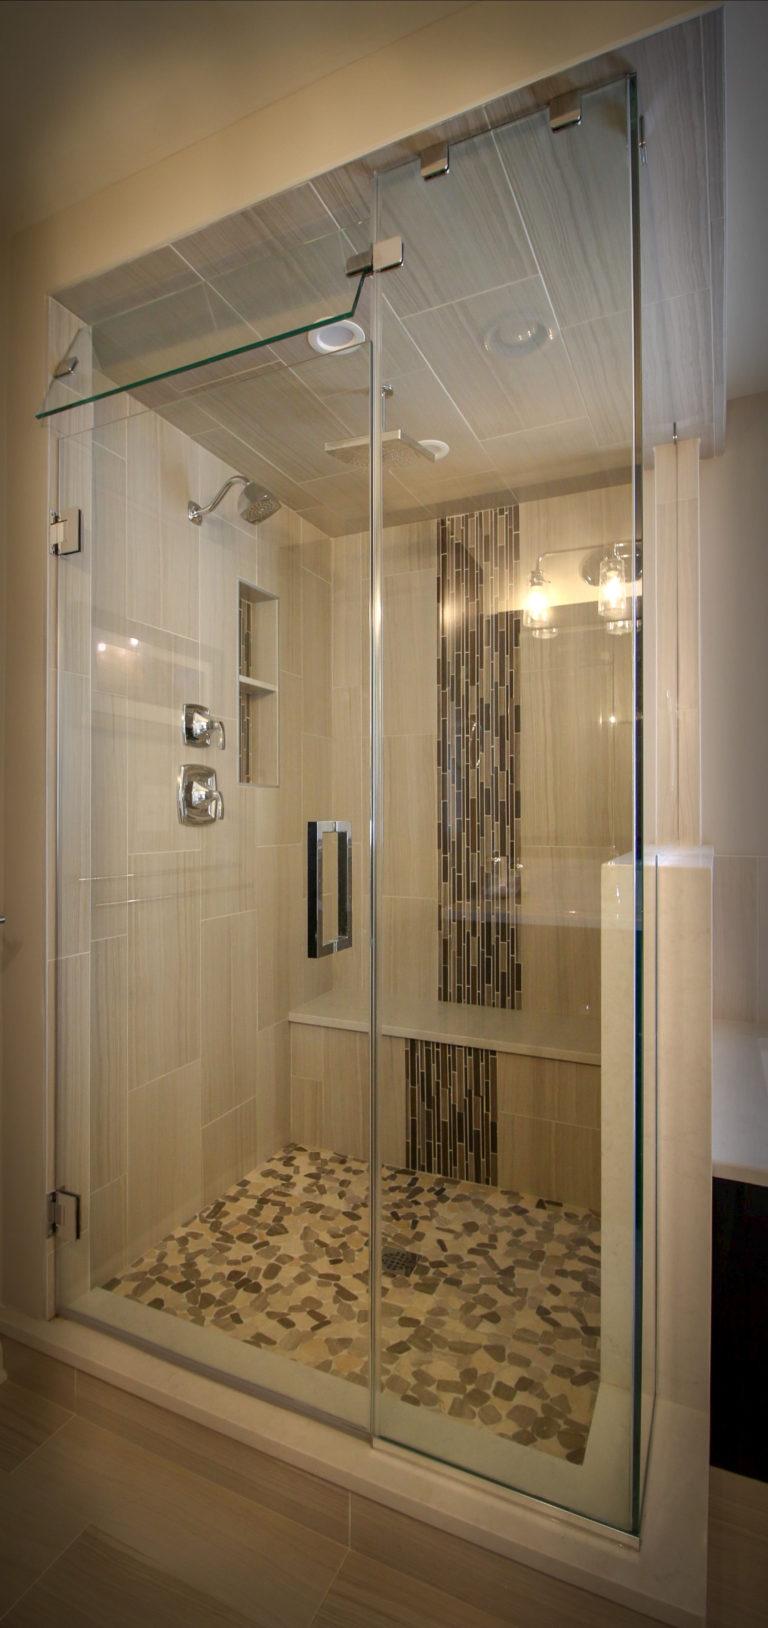 Bathroom Shower Remodel with Cascading Tile